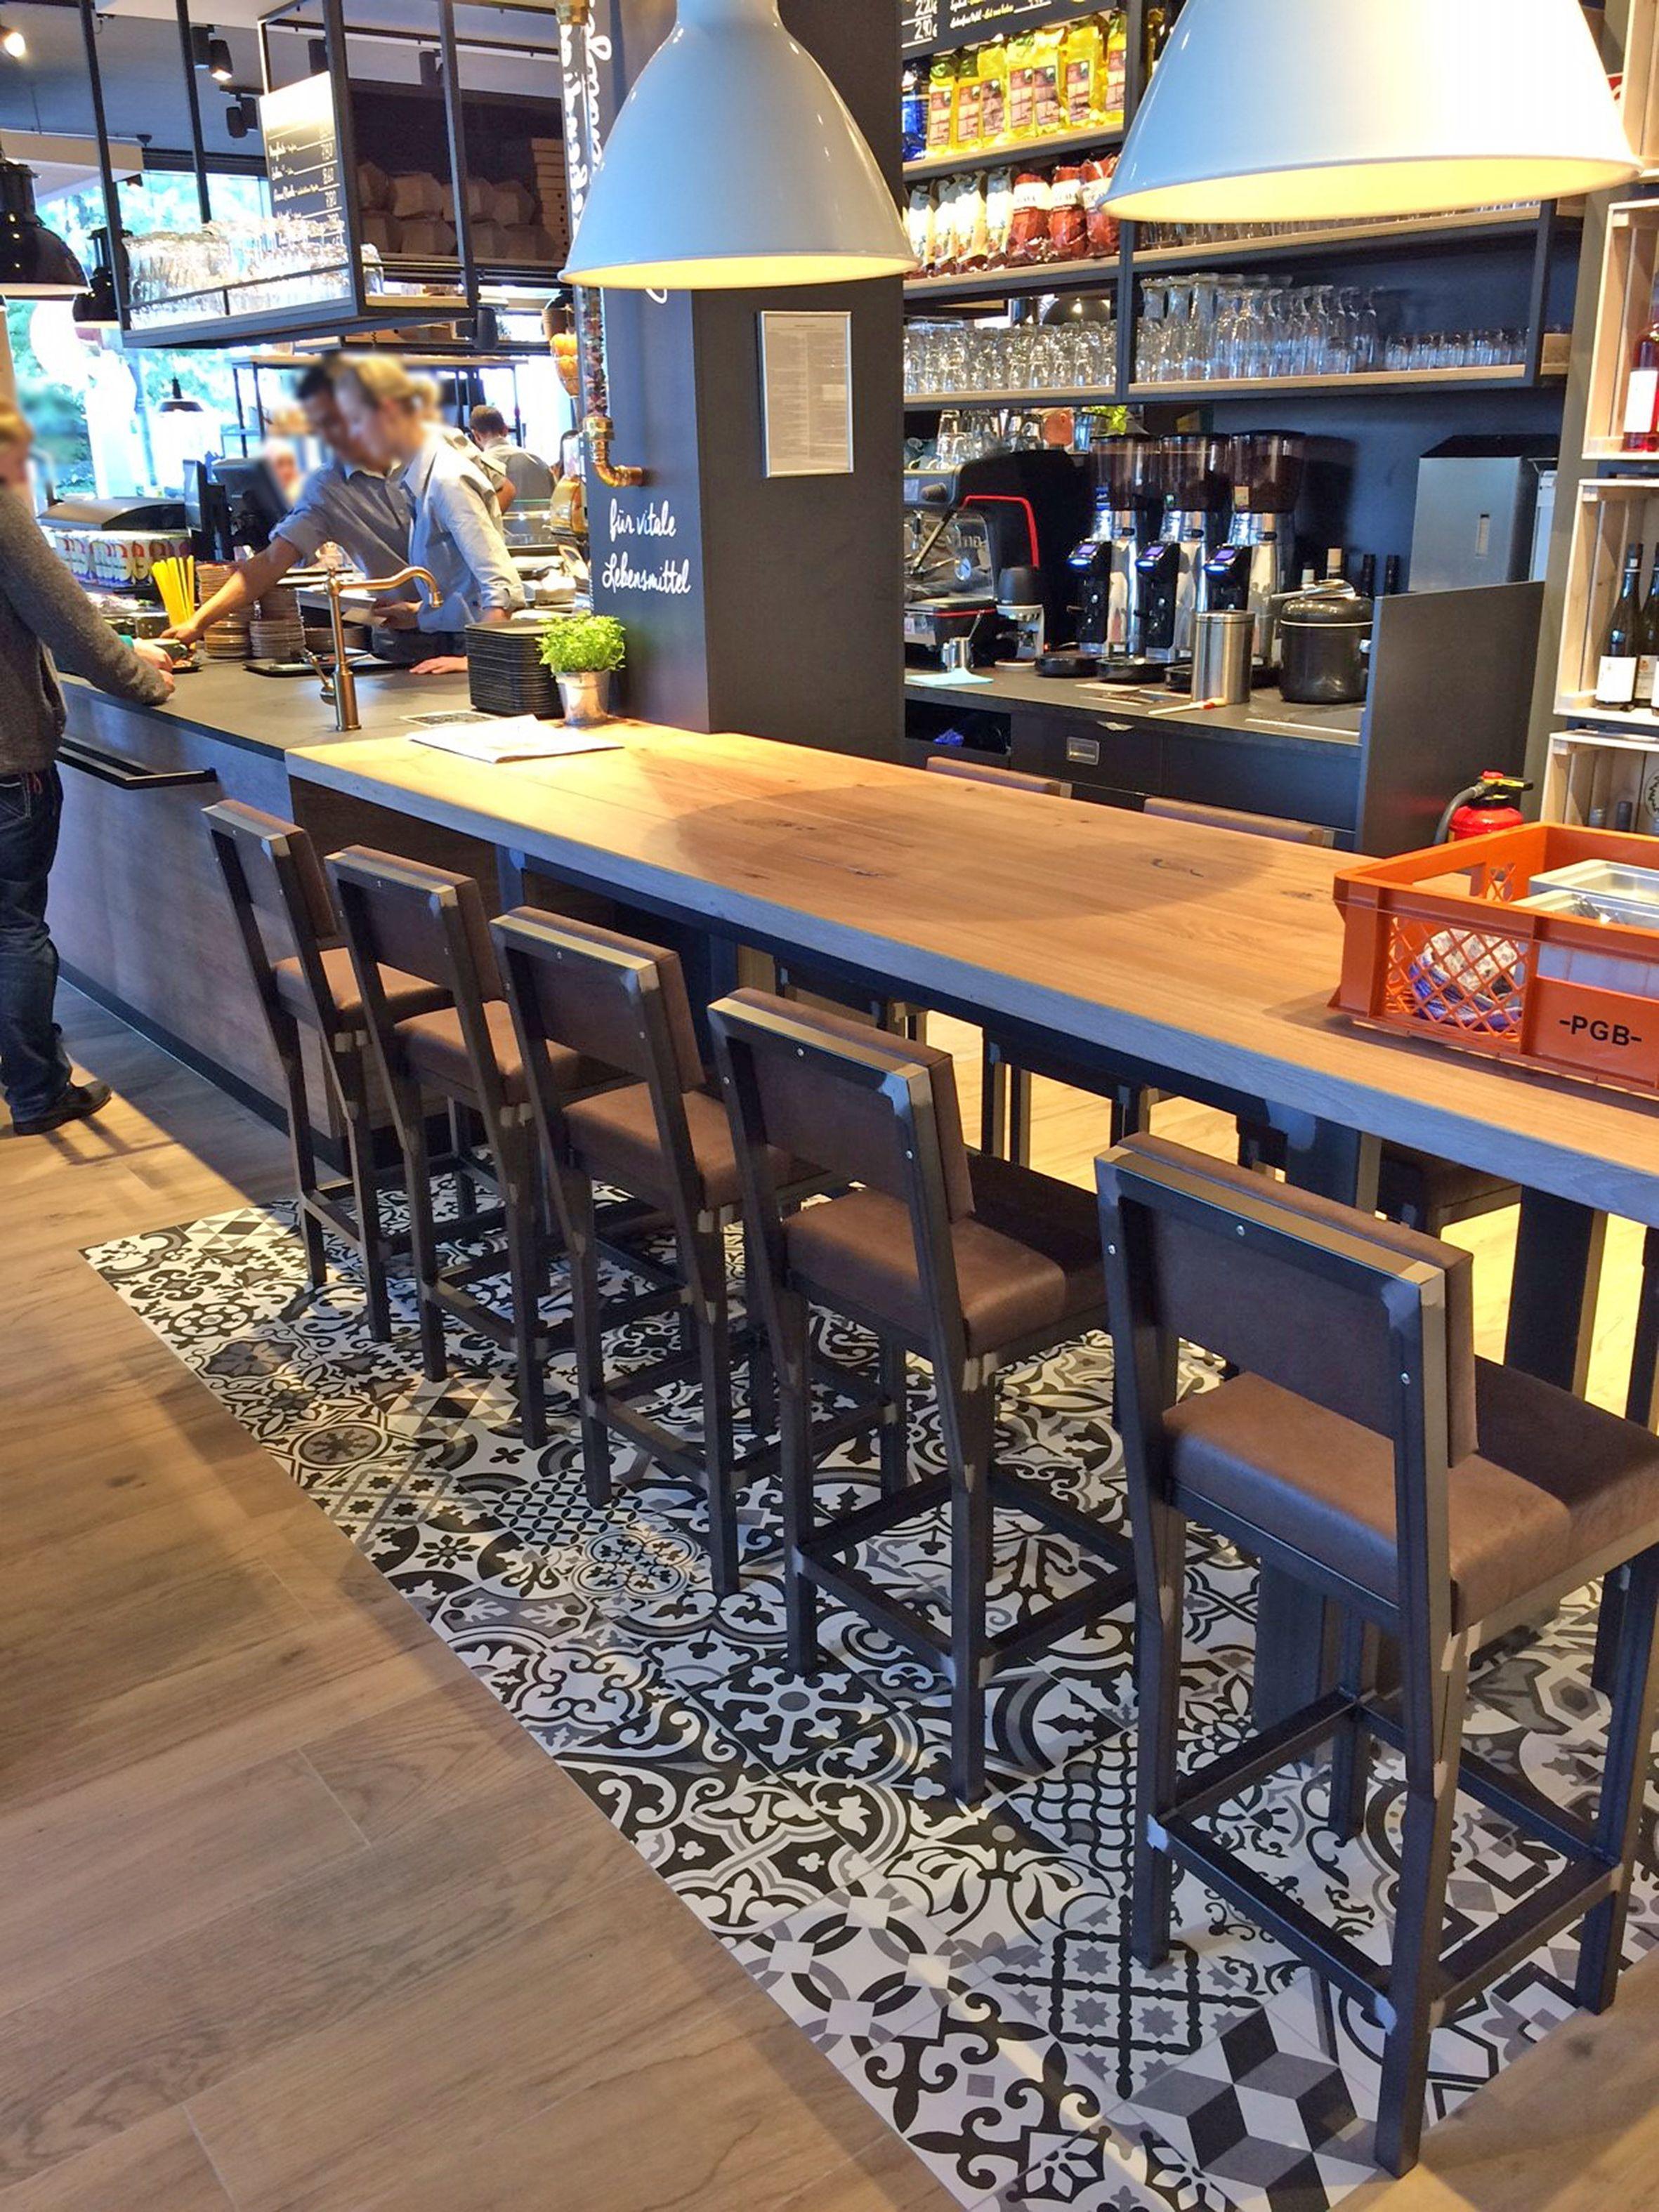 html gastronomie mobel bestuhlung lounge mobel ladenbau innenausbau barhocker tisch